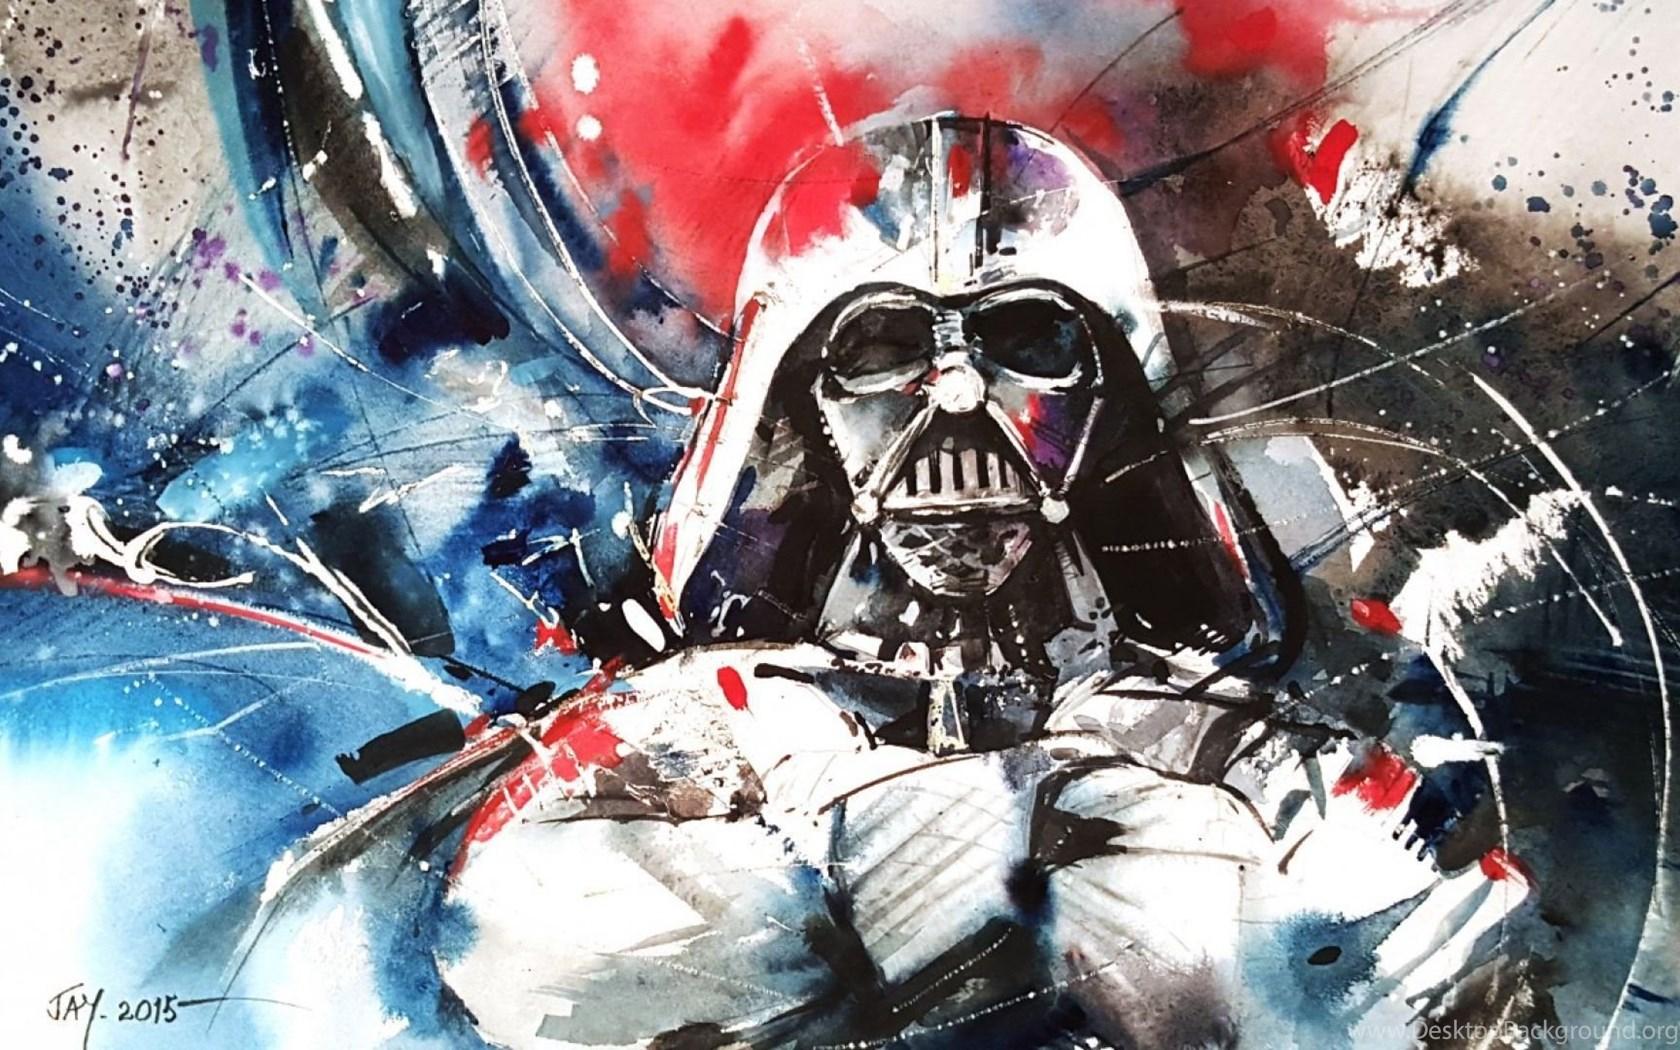 Full Hd 1080p Darth Vader Wallpapers Hd Desktop Backgrounds 1920x1080 Desktop Background